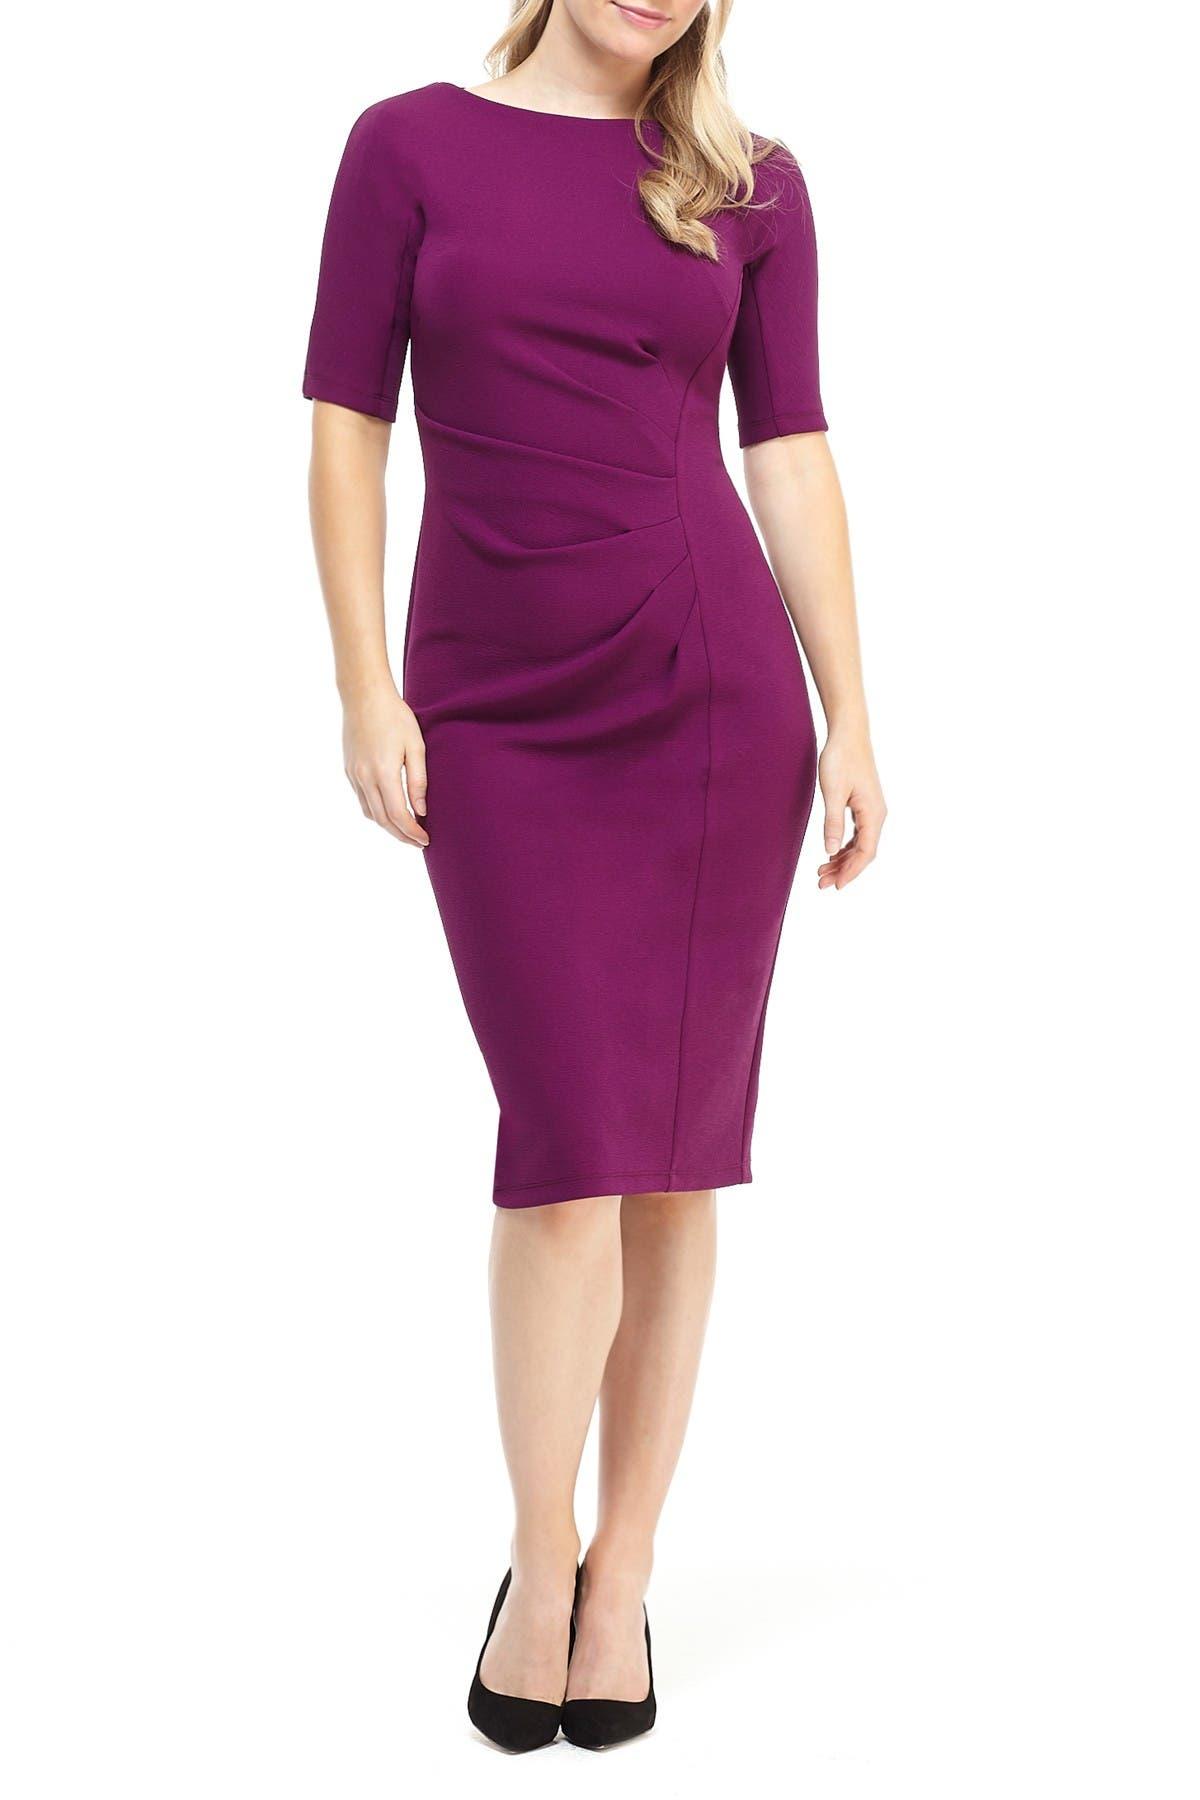 Image of Maggy London Gigi Ruched Midi Dress